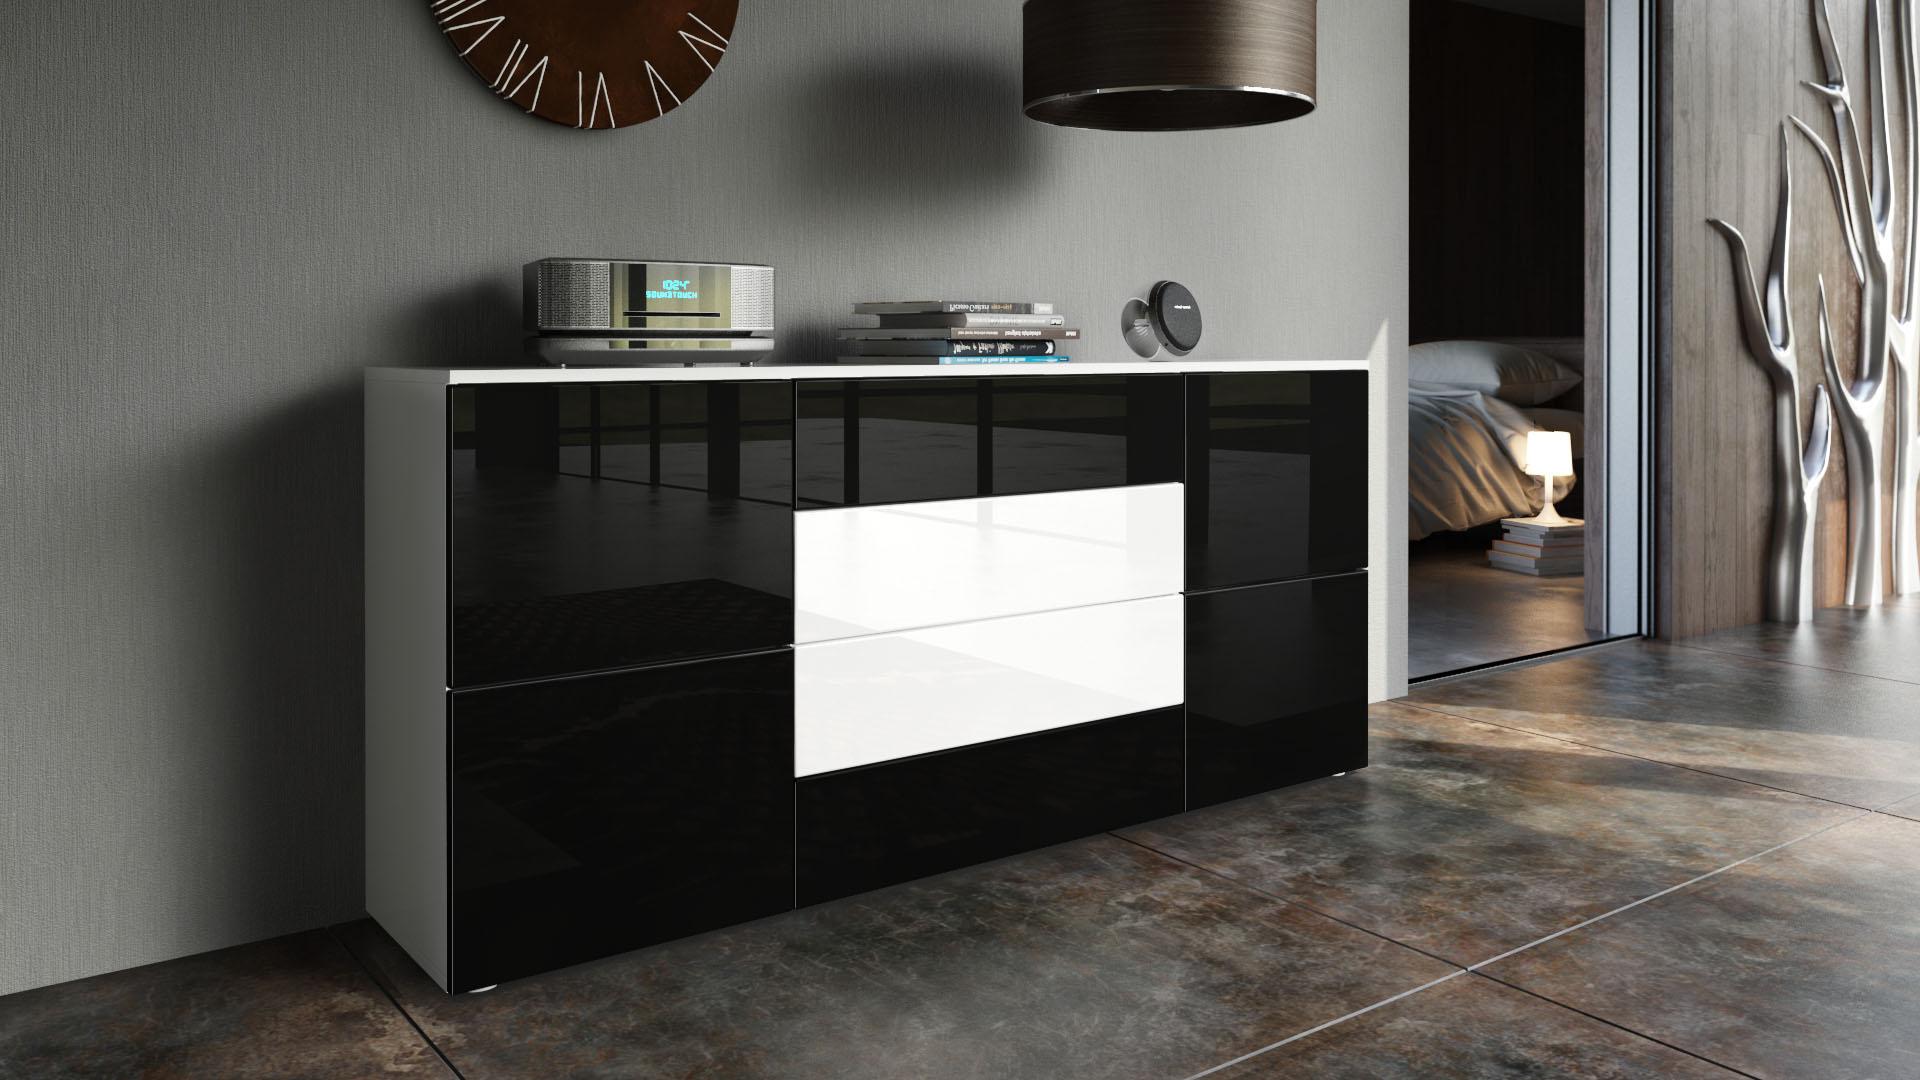 sideboard anrichte schrank kommode rova tv m bel wei matt hochglanz holzoptik ebay. Black Bedroom Furniture Sets. Home Design Ideas